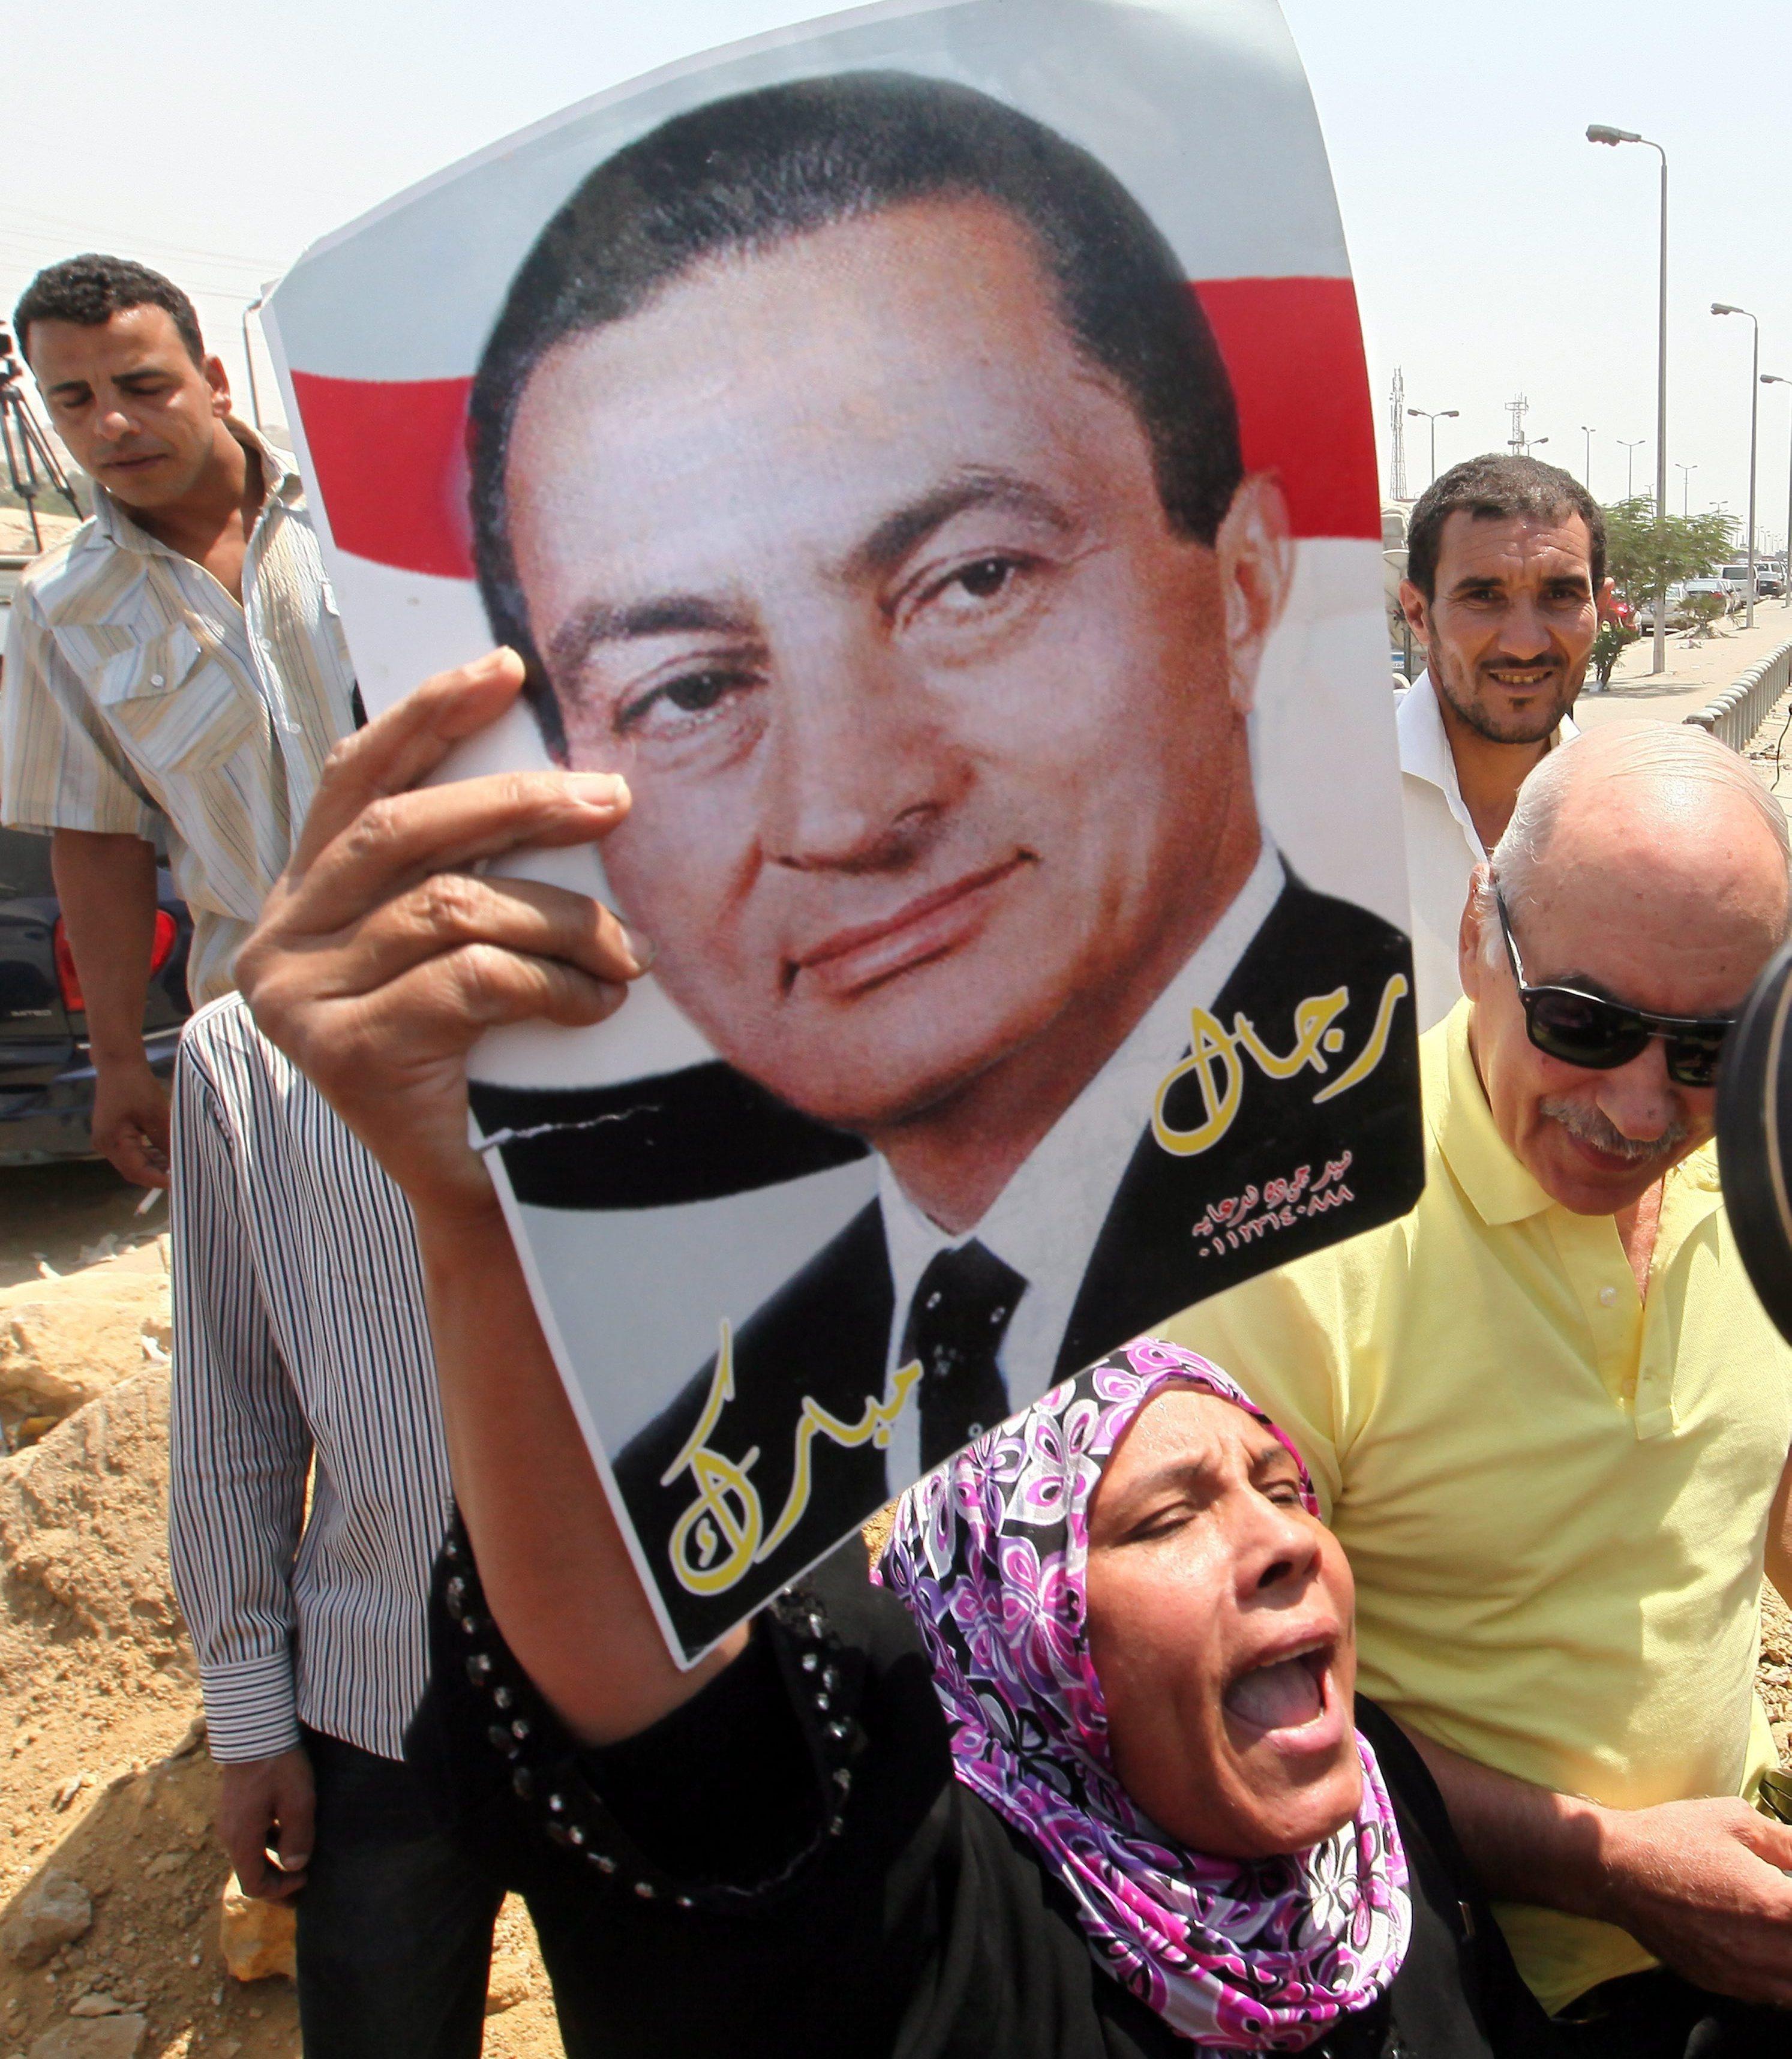 Mubarak Released From Prison, Now Under House Arrest